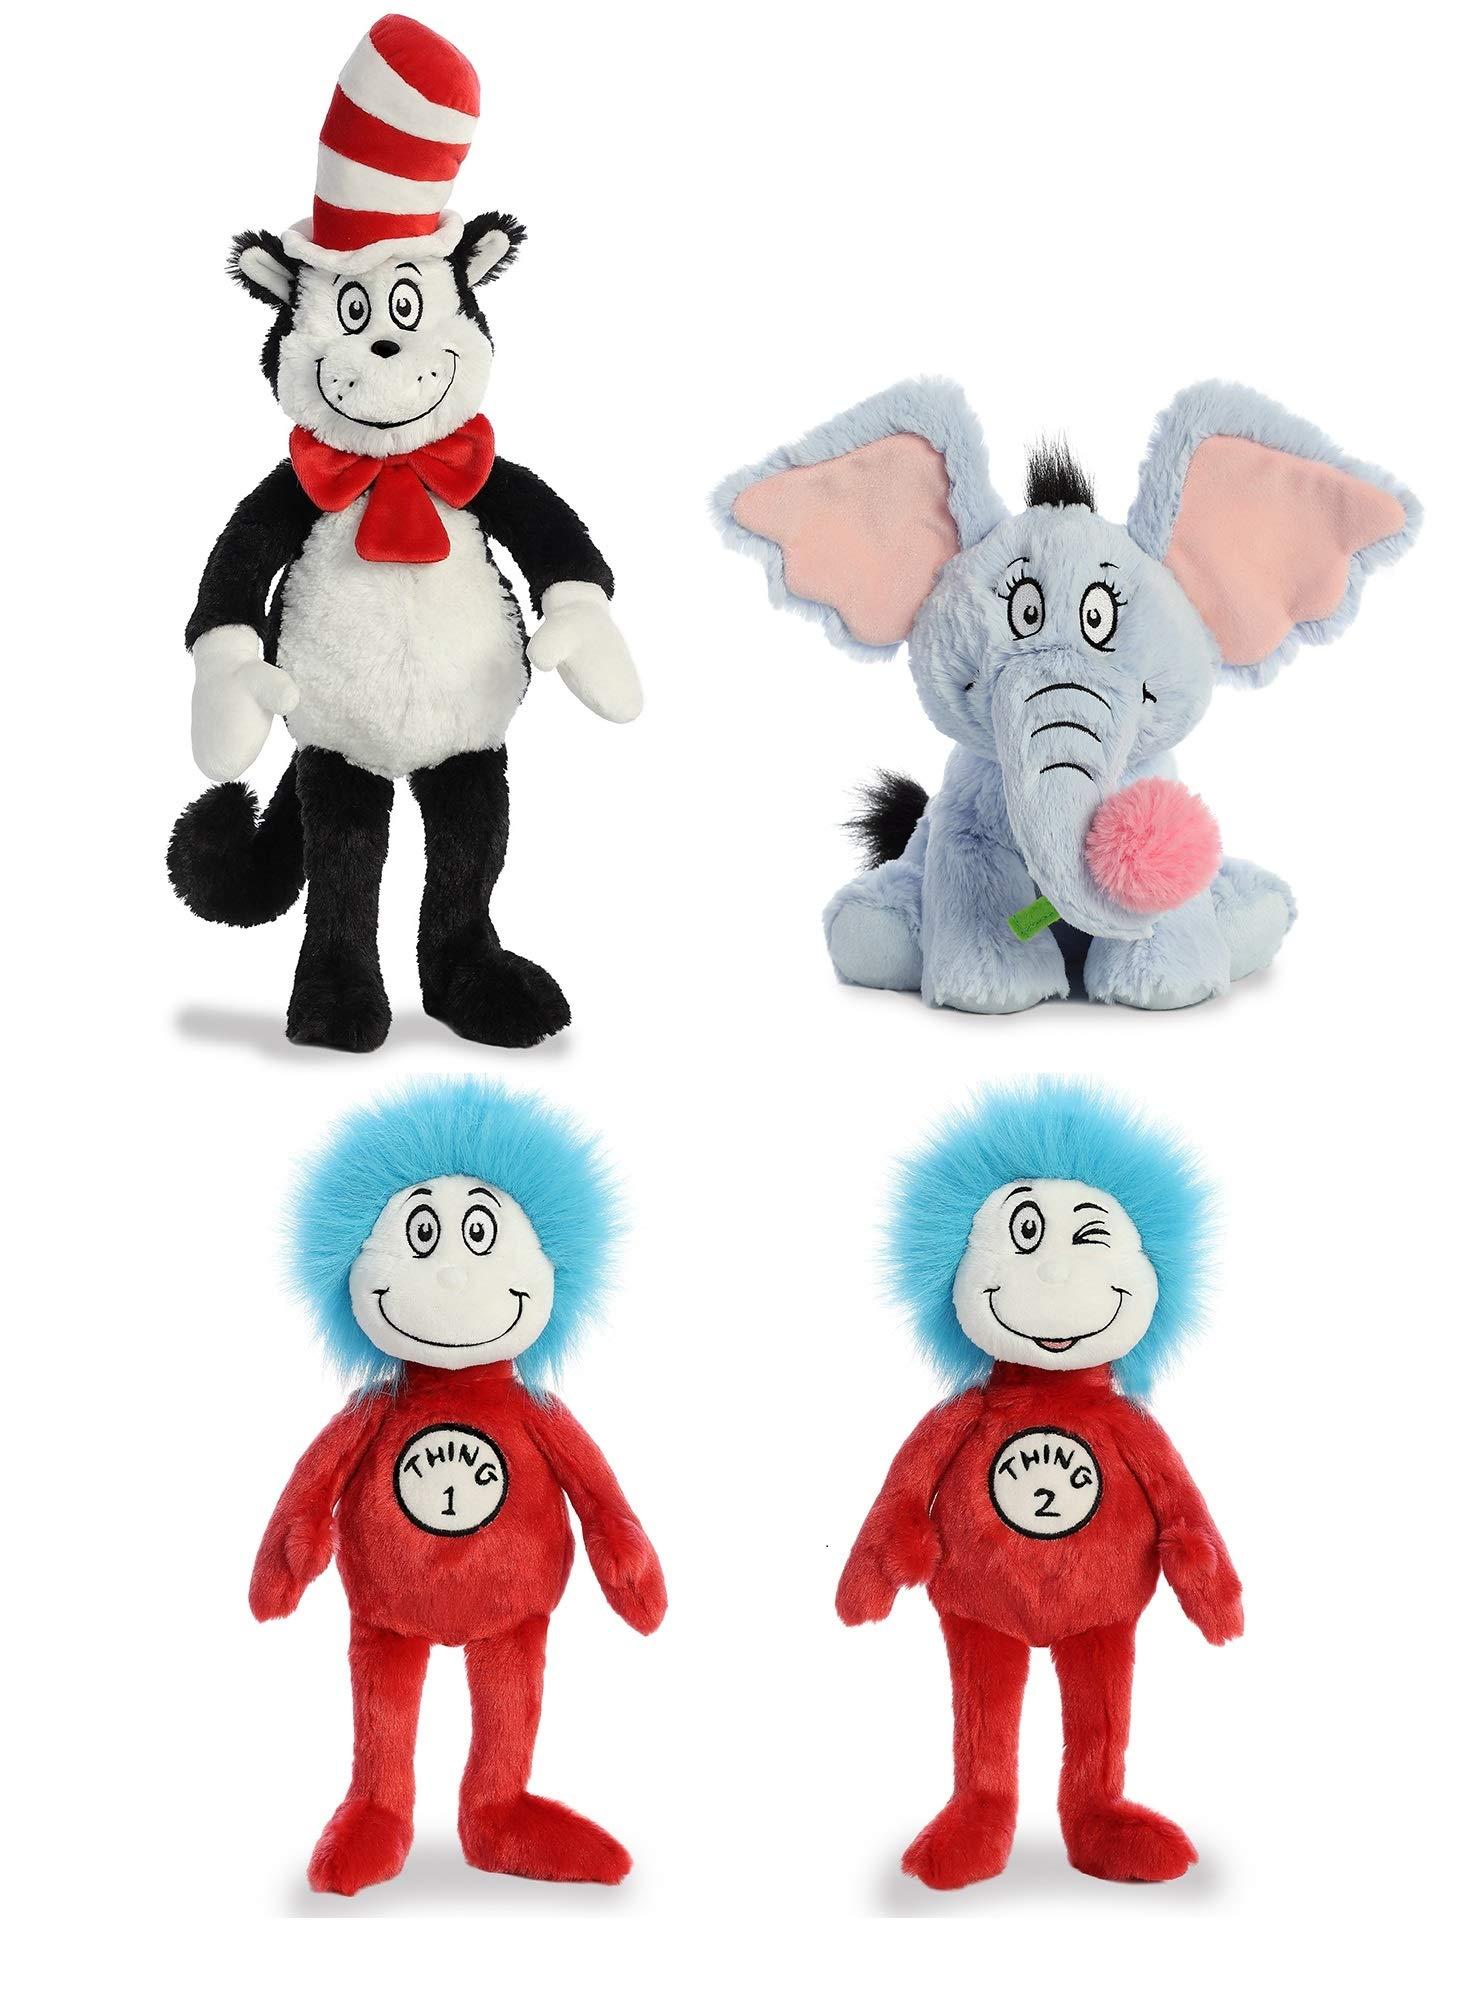 Aurora Plush Bundle Set of 4 Cat in The Hat Toys - Dr Seuss Toys 20'' Cat in The Hat Stuffed Plush, 12'' Thing 1 & Thing 2, and 12'' Horton Plush Elephant by RfR Bundles